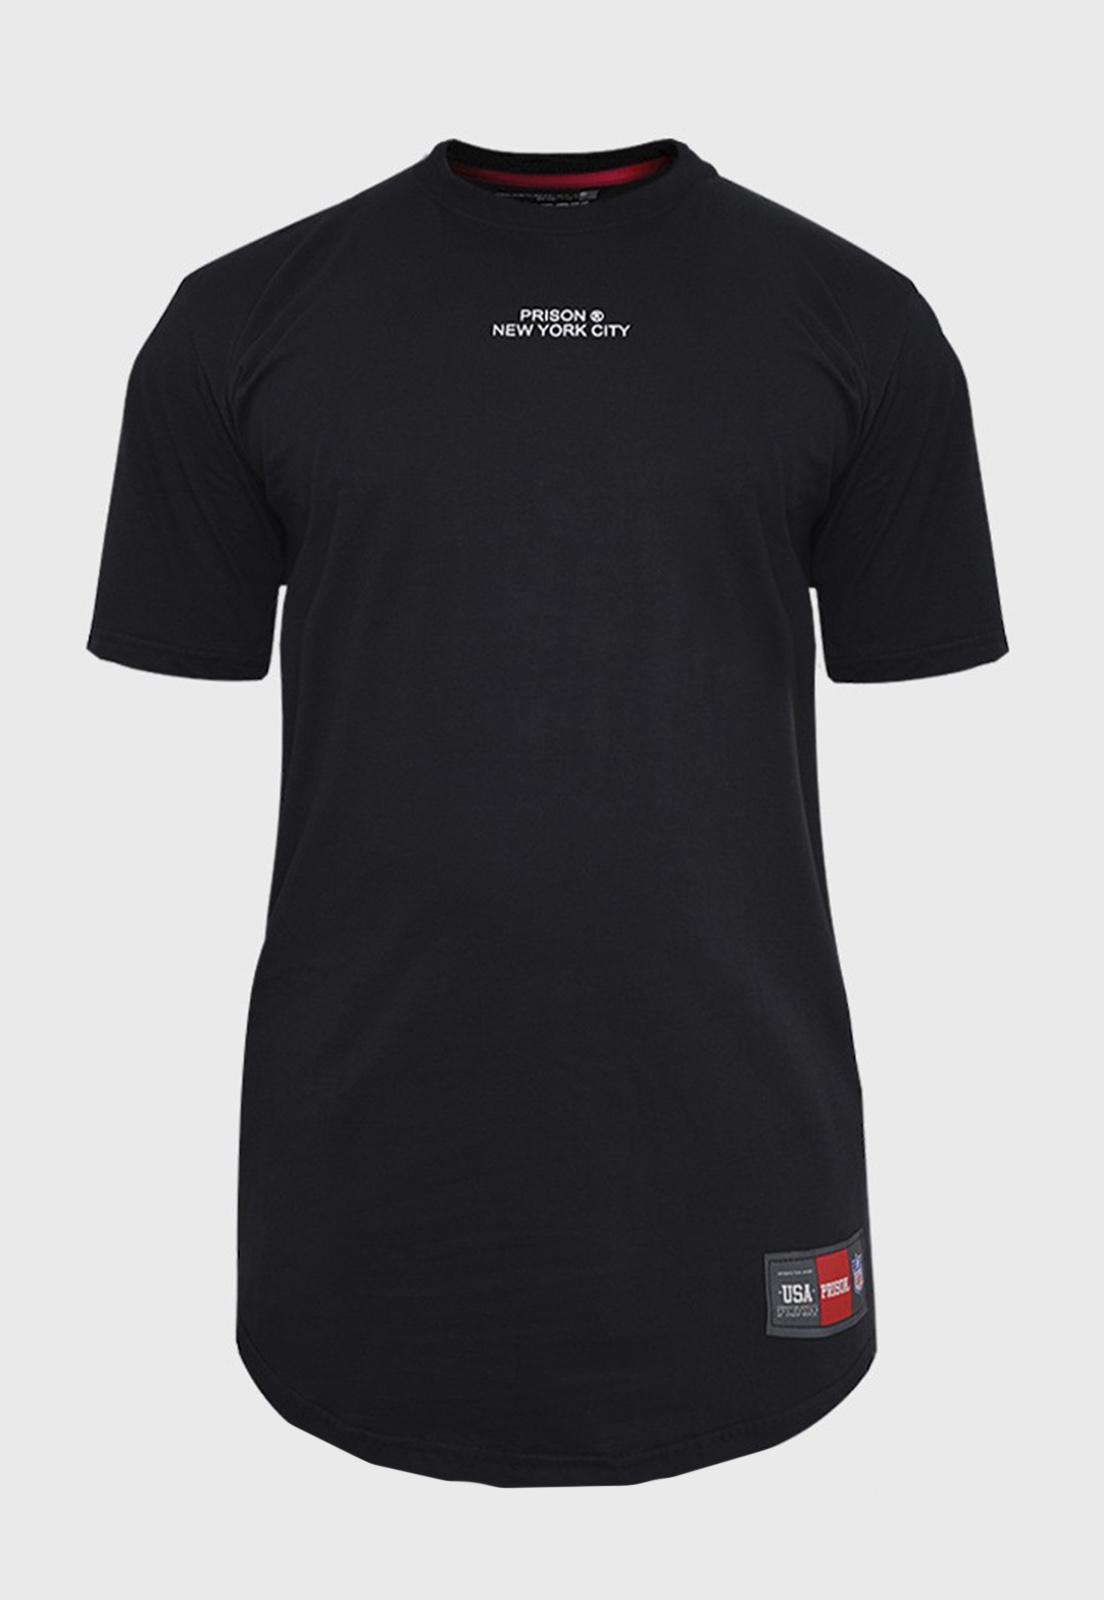 Camiseta Longline Preta New York Prison